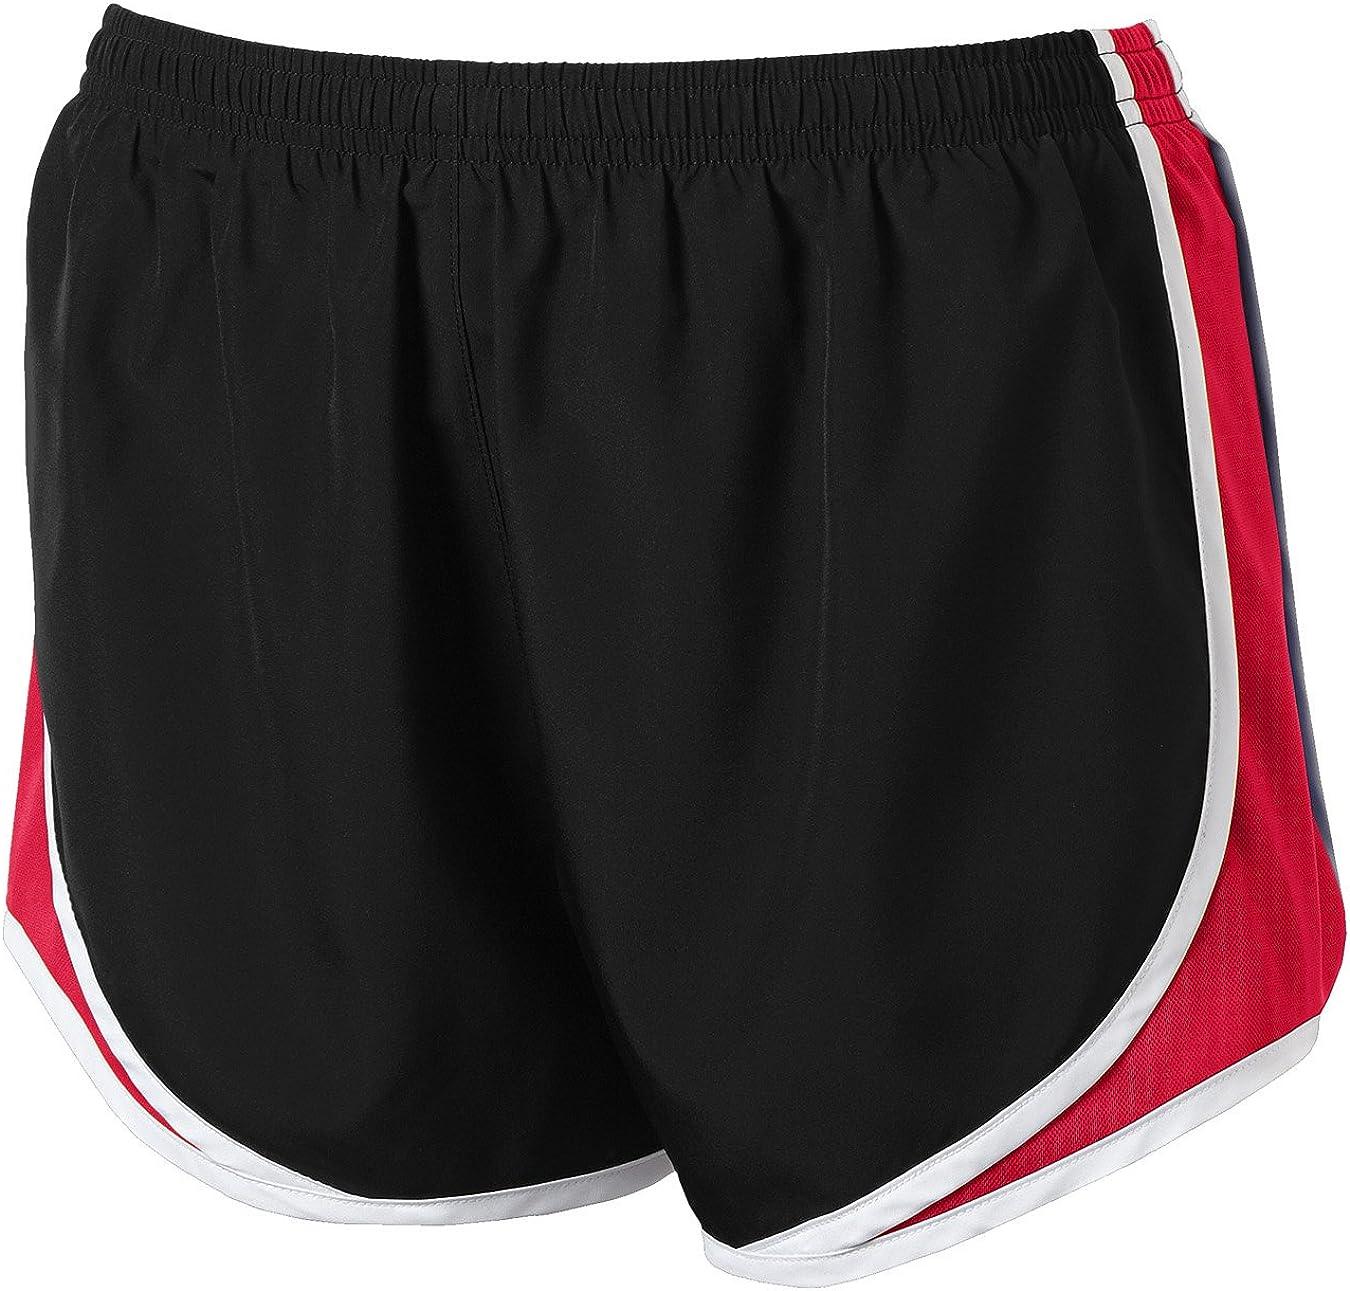 Joe's USA Ladies Moisture-Wicking Track & Field Running Shorts inSizes: XS-4XL